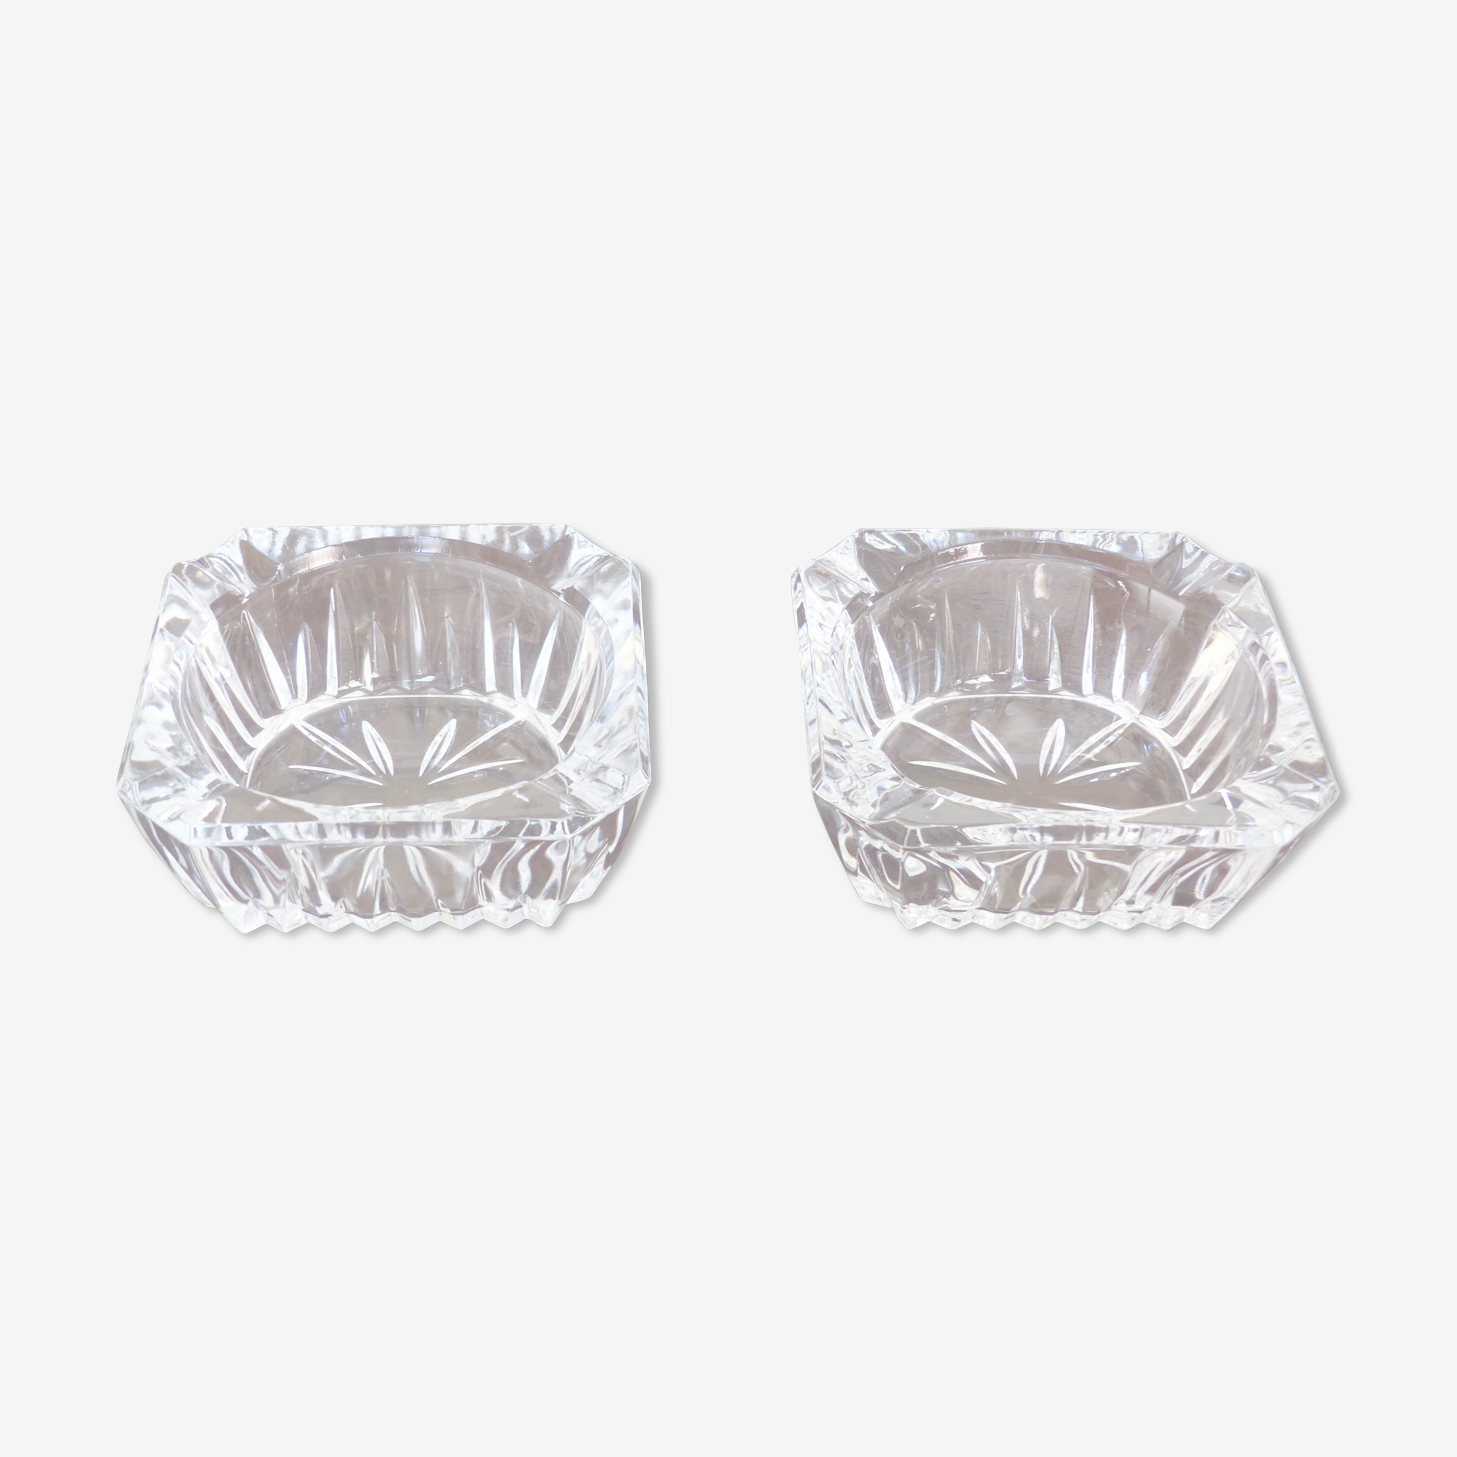 2 crystal ashtrays